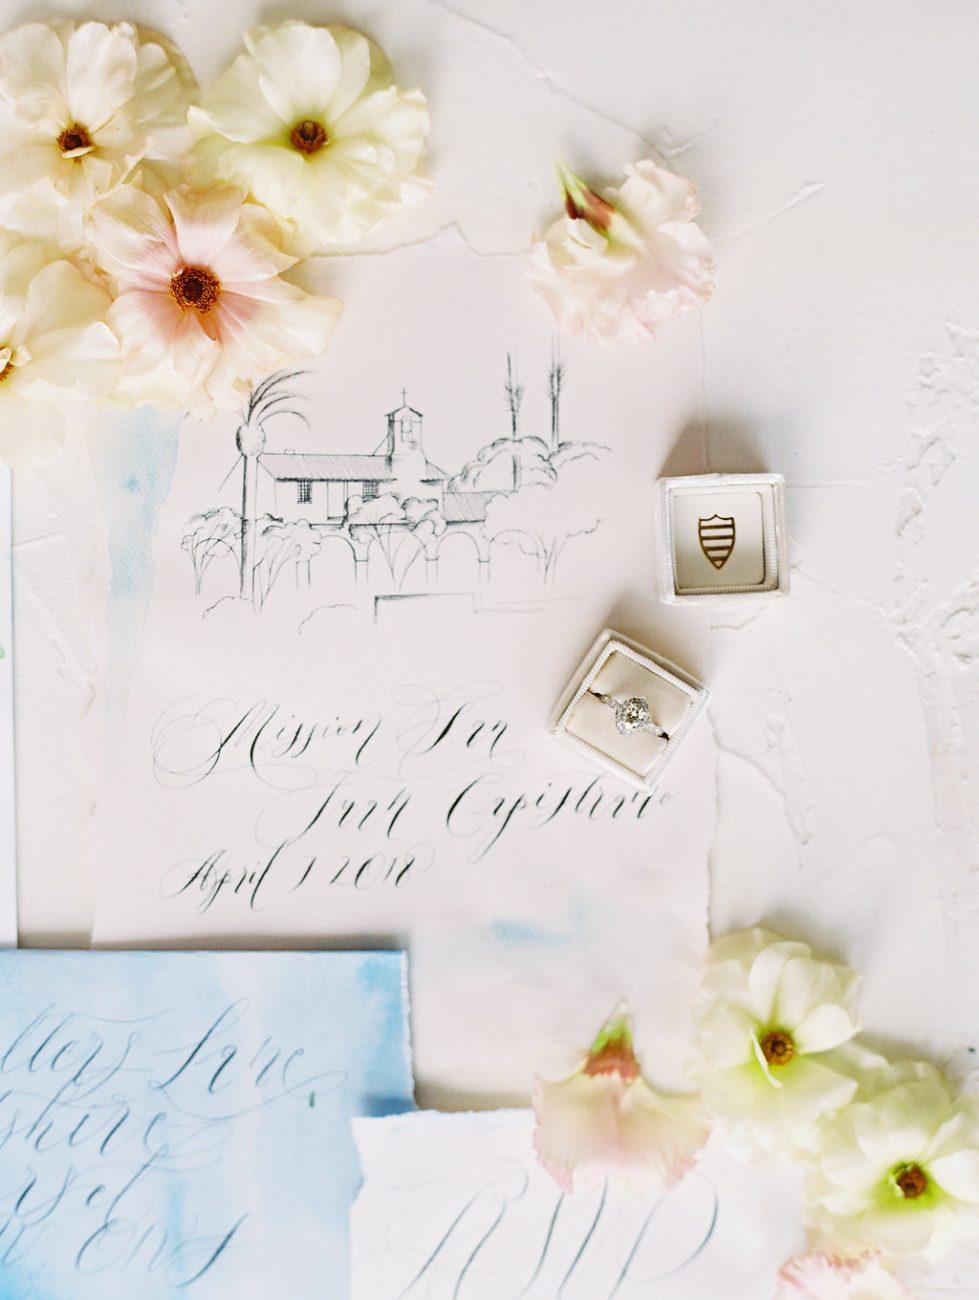 Watercolour wedding invitations venue with ring